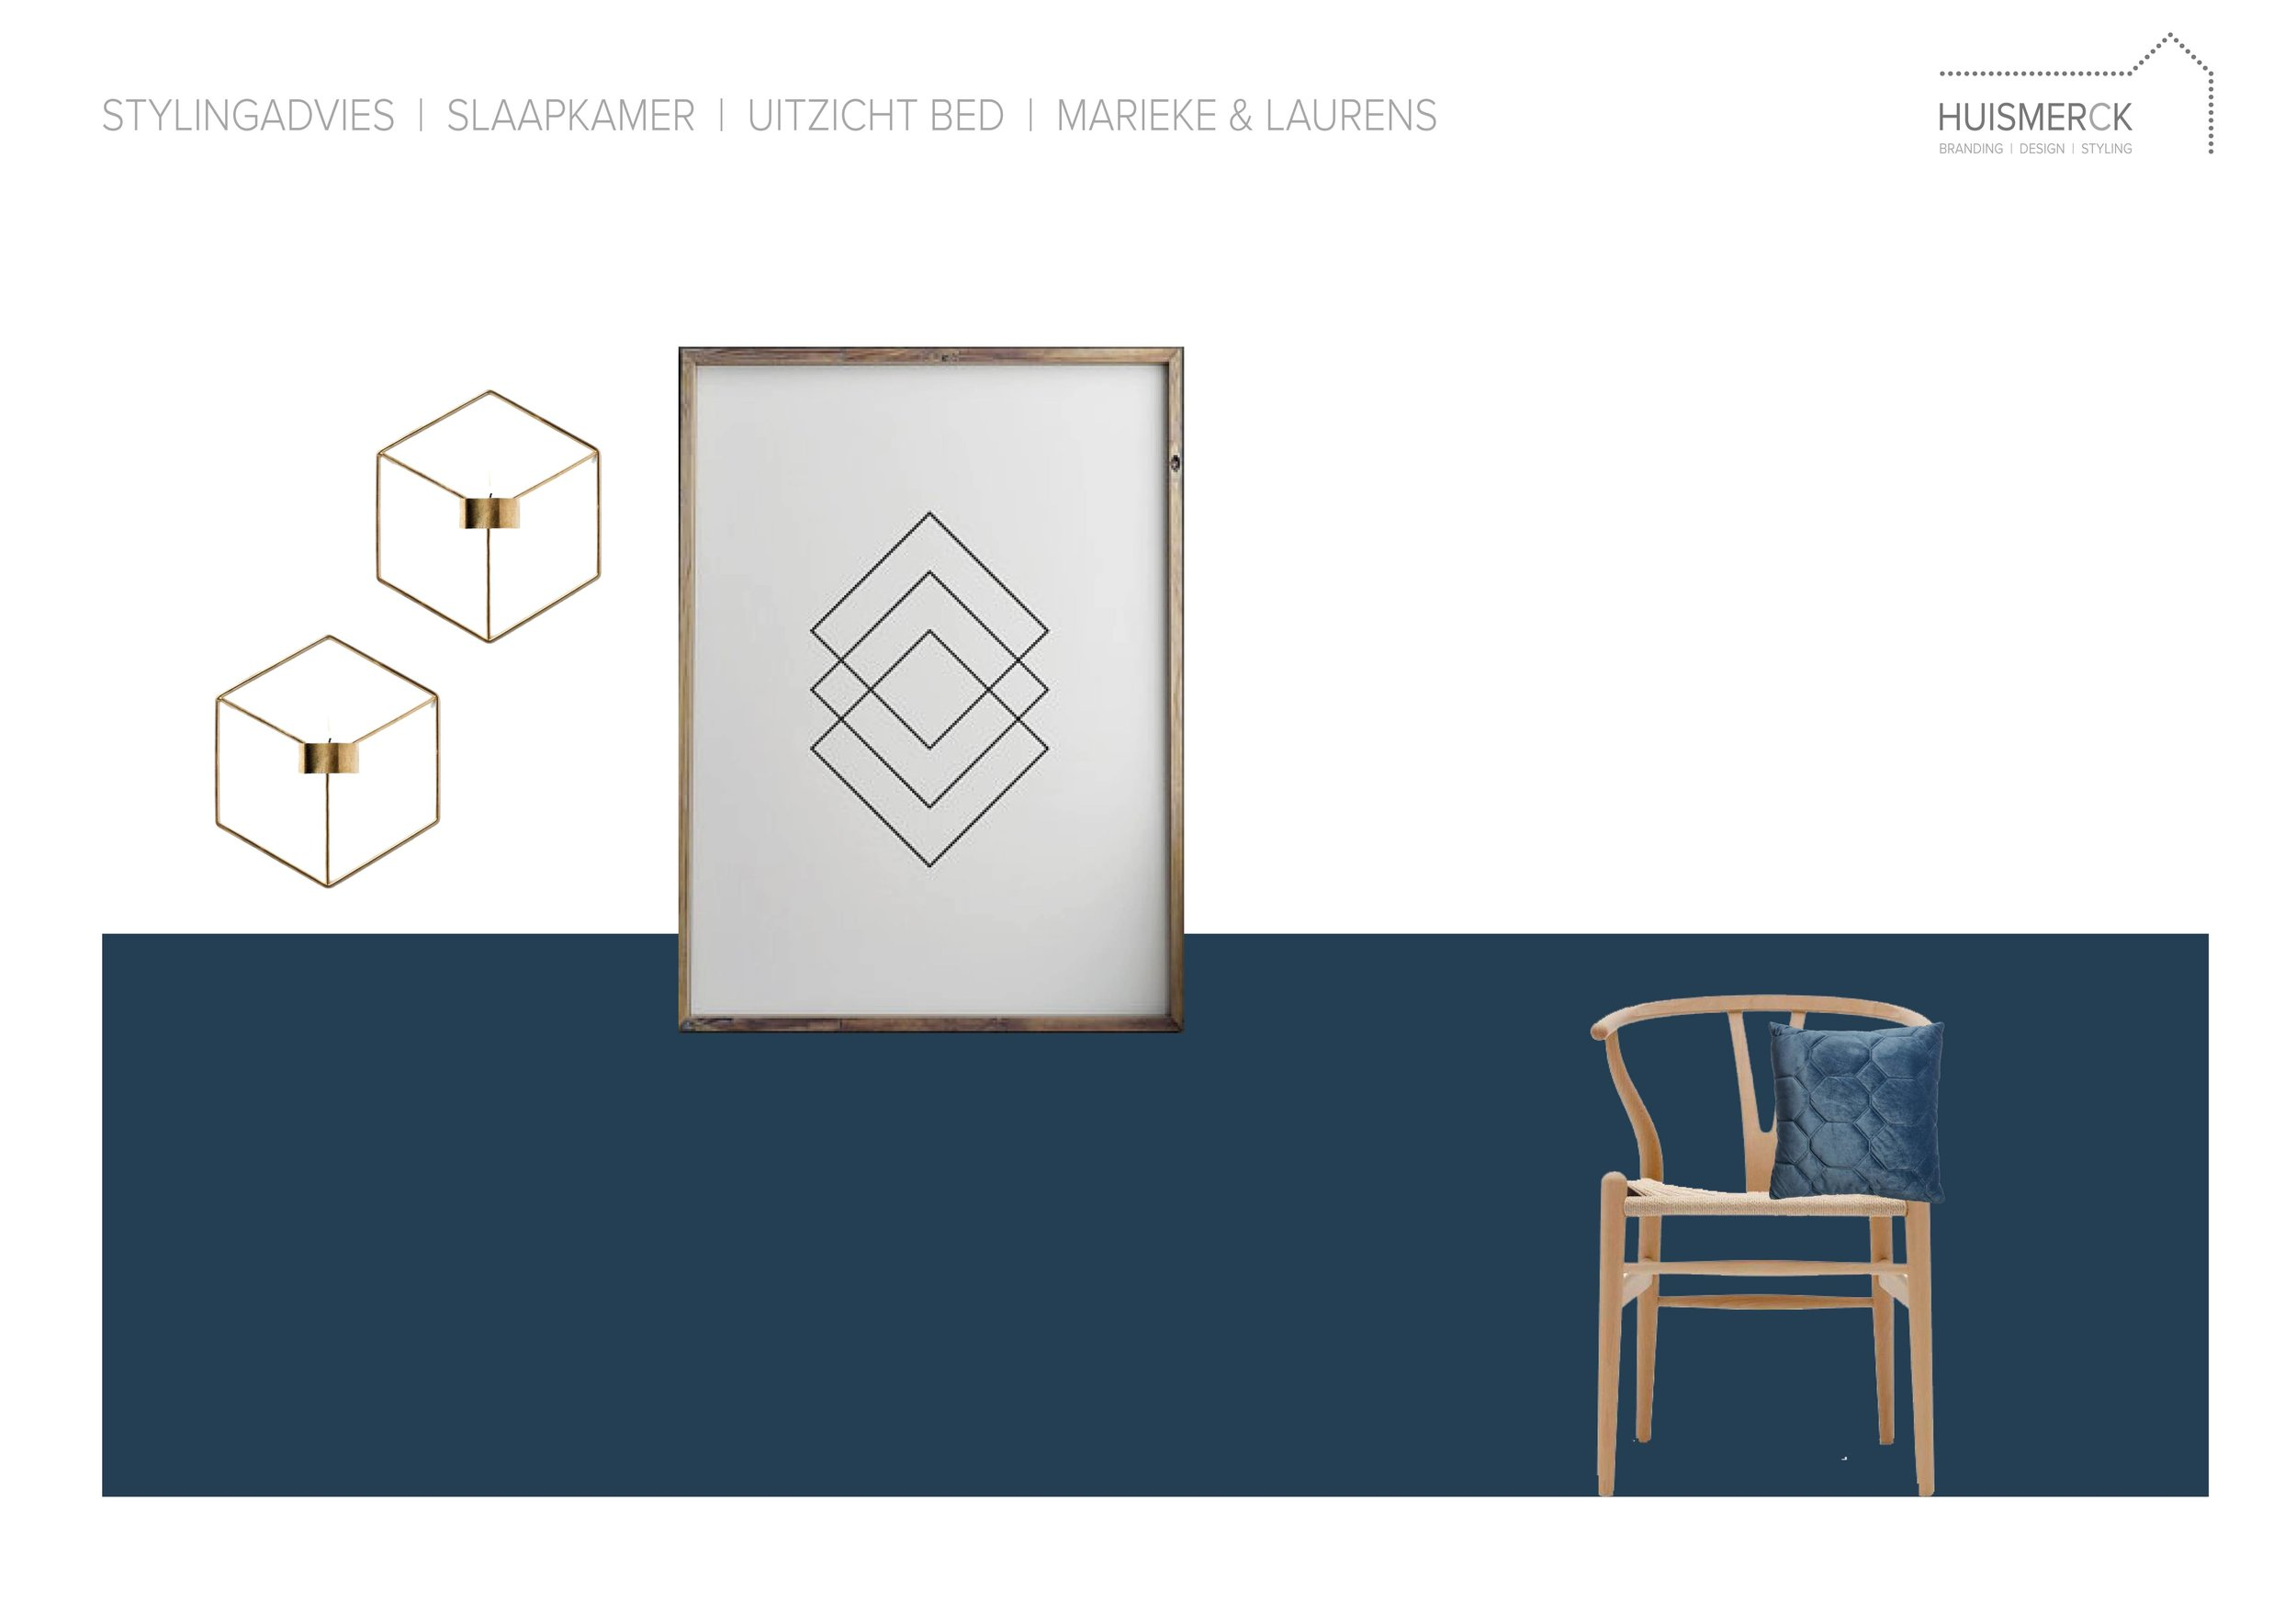 HUISMERCK®_Stylingadvies_Slaapkamer_uitzicht_bed_M&L_Enschede (lambrisering blauw)-01.jpg